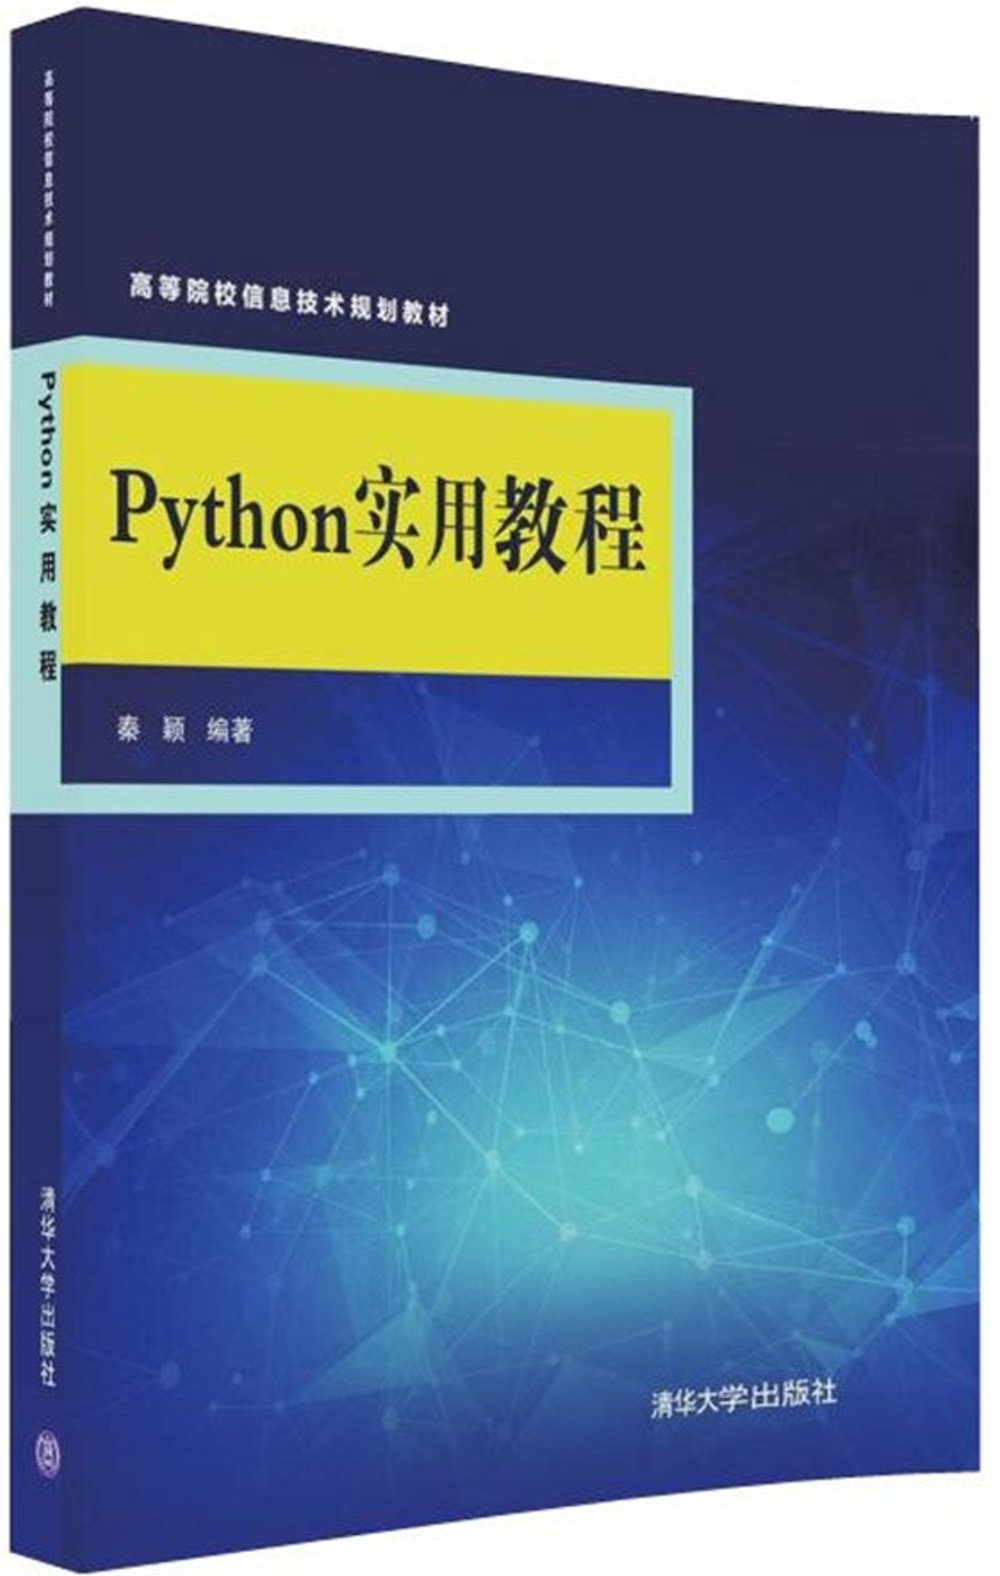 Python 教程